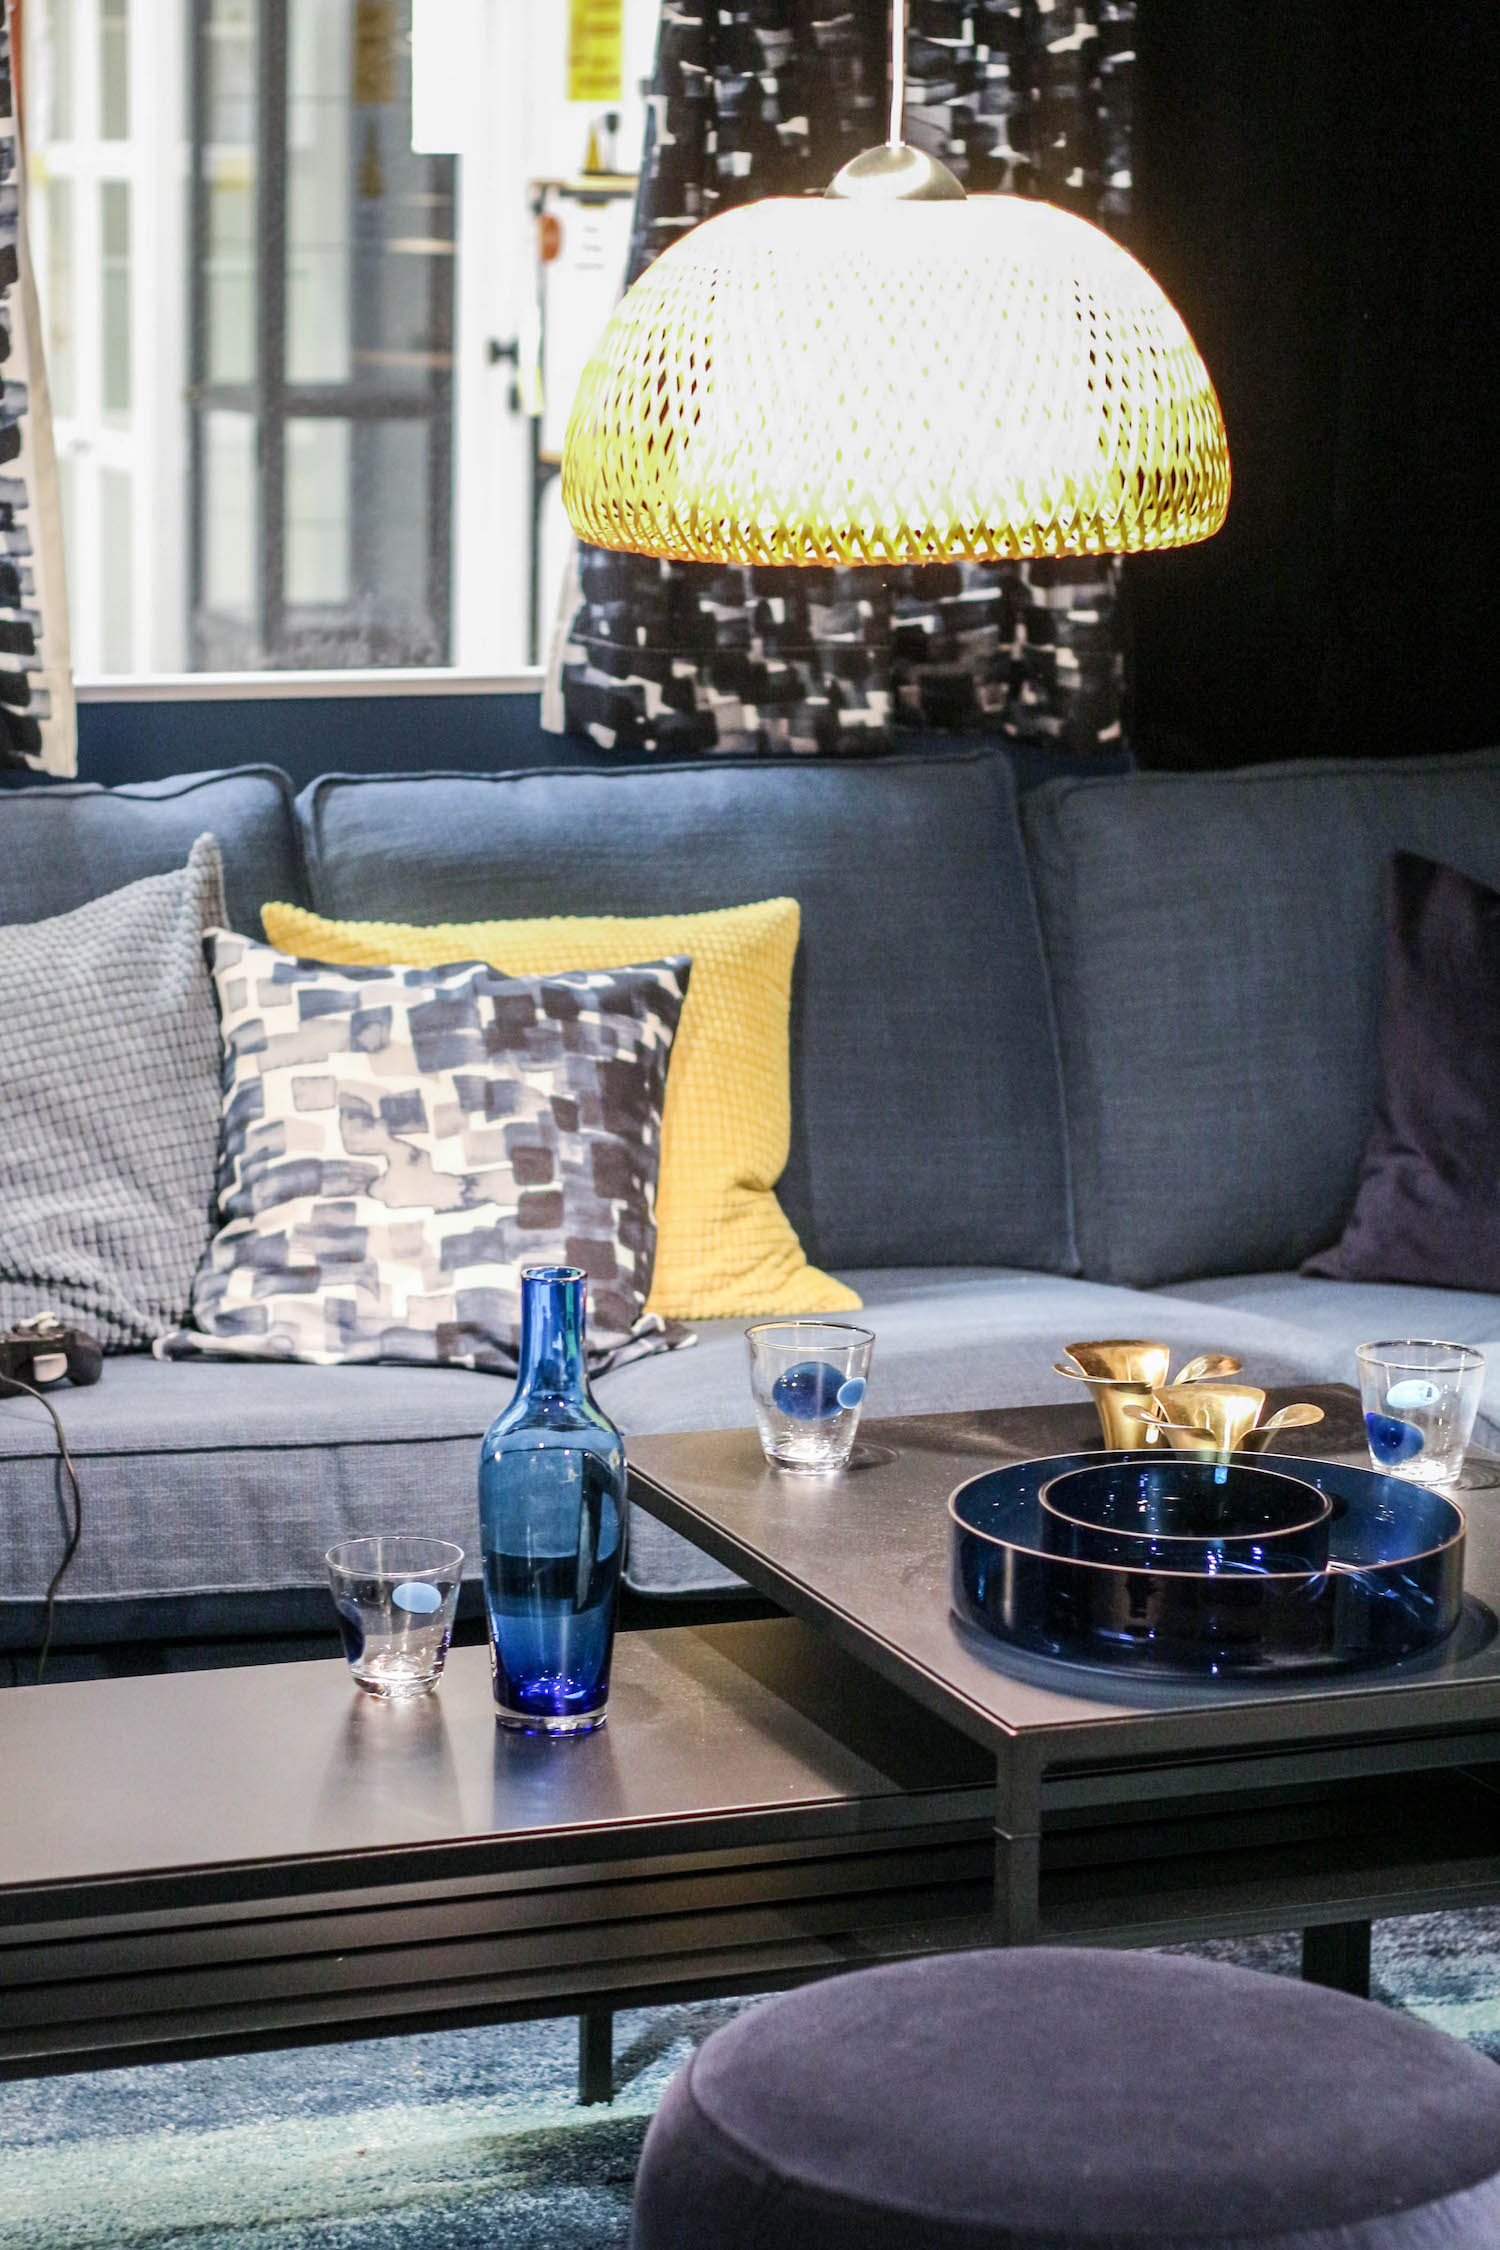 neuheiten bei ikea angebote room for friends sara bow. Black Bedroom Furniture Sets. Home Design Ideas